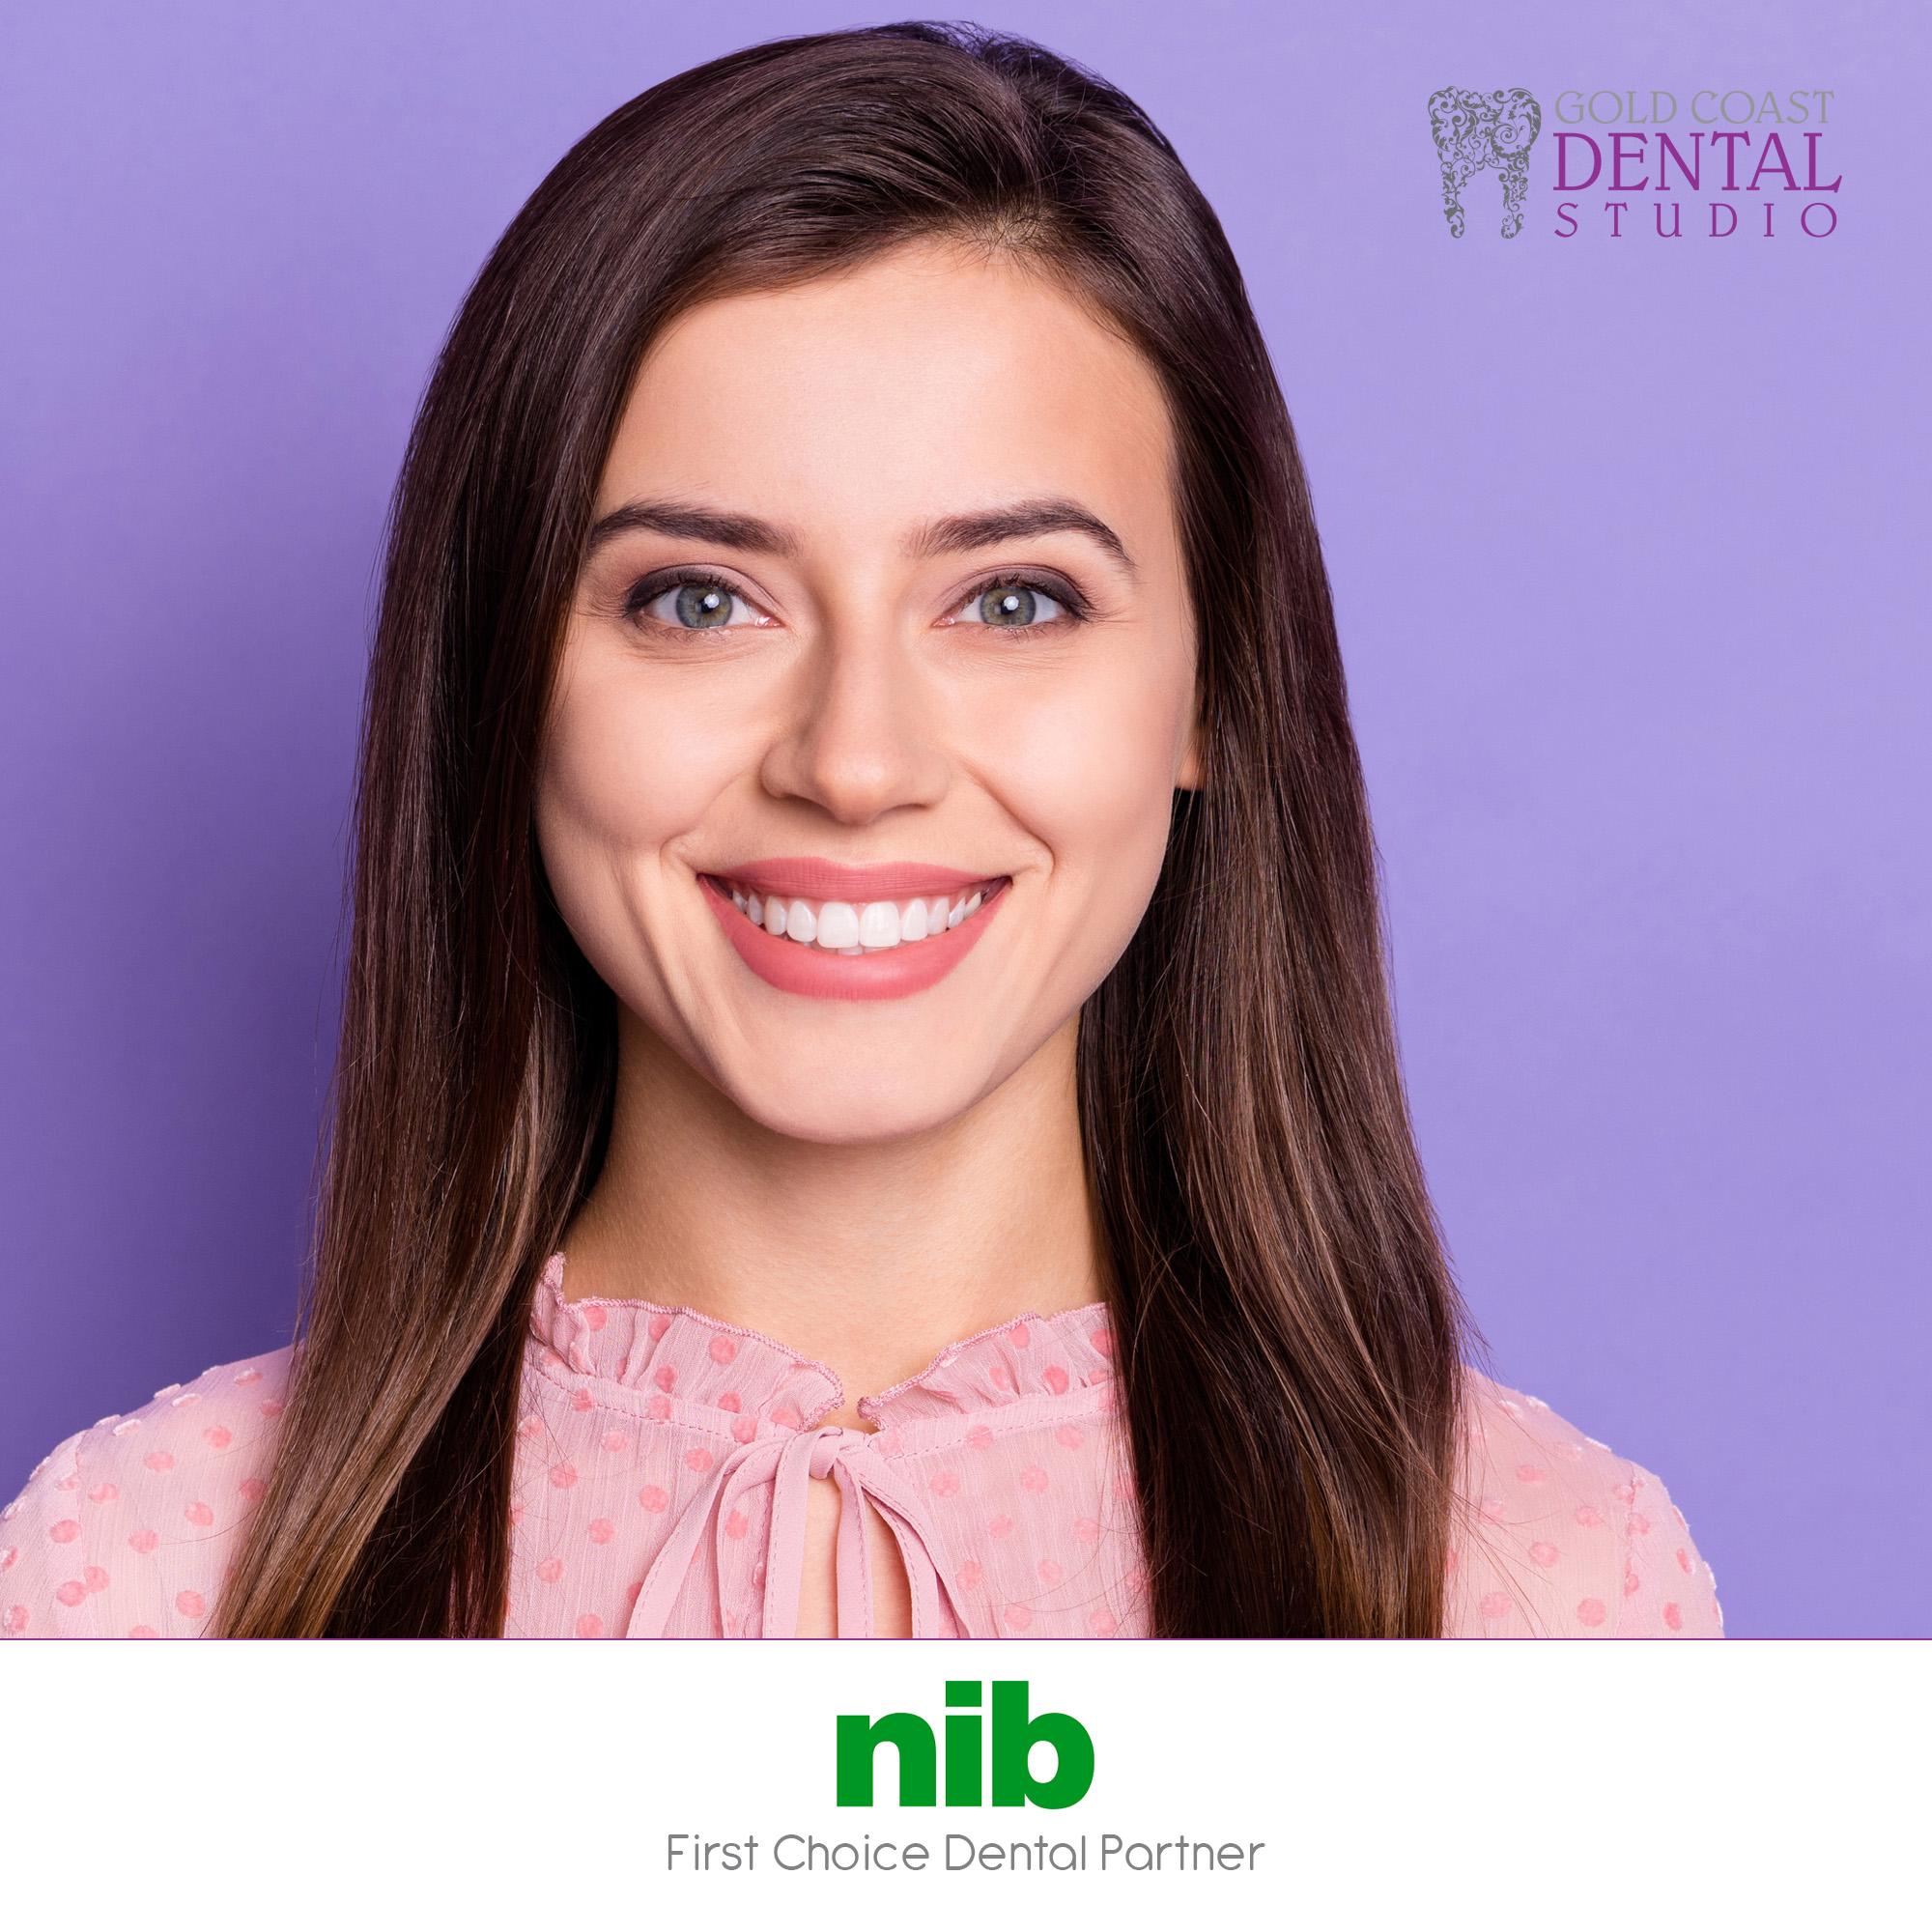 NIB First Choice Dental Network Partner